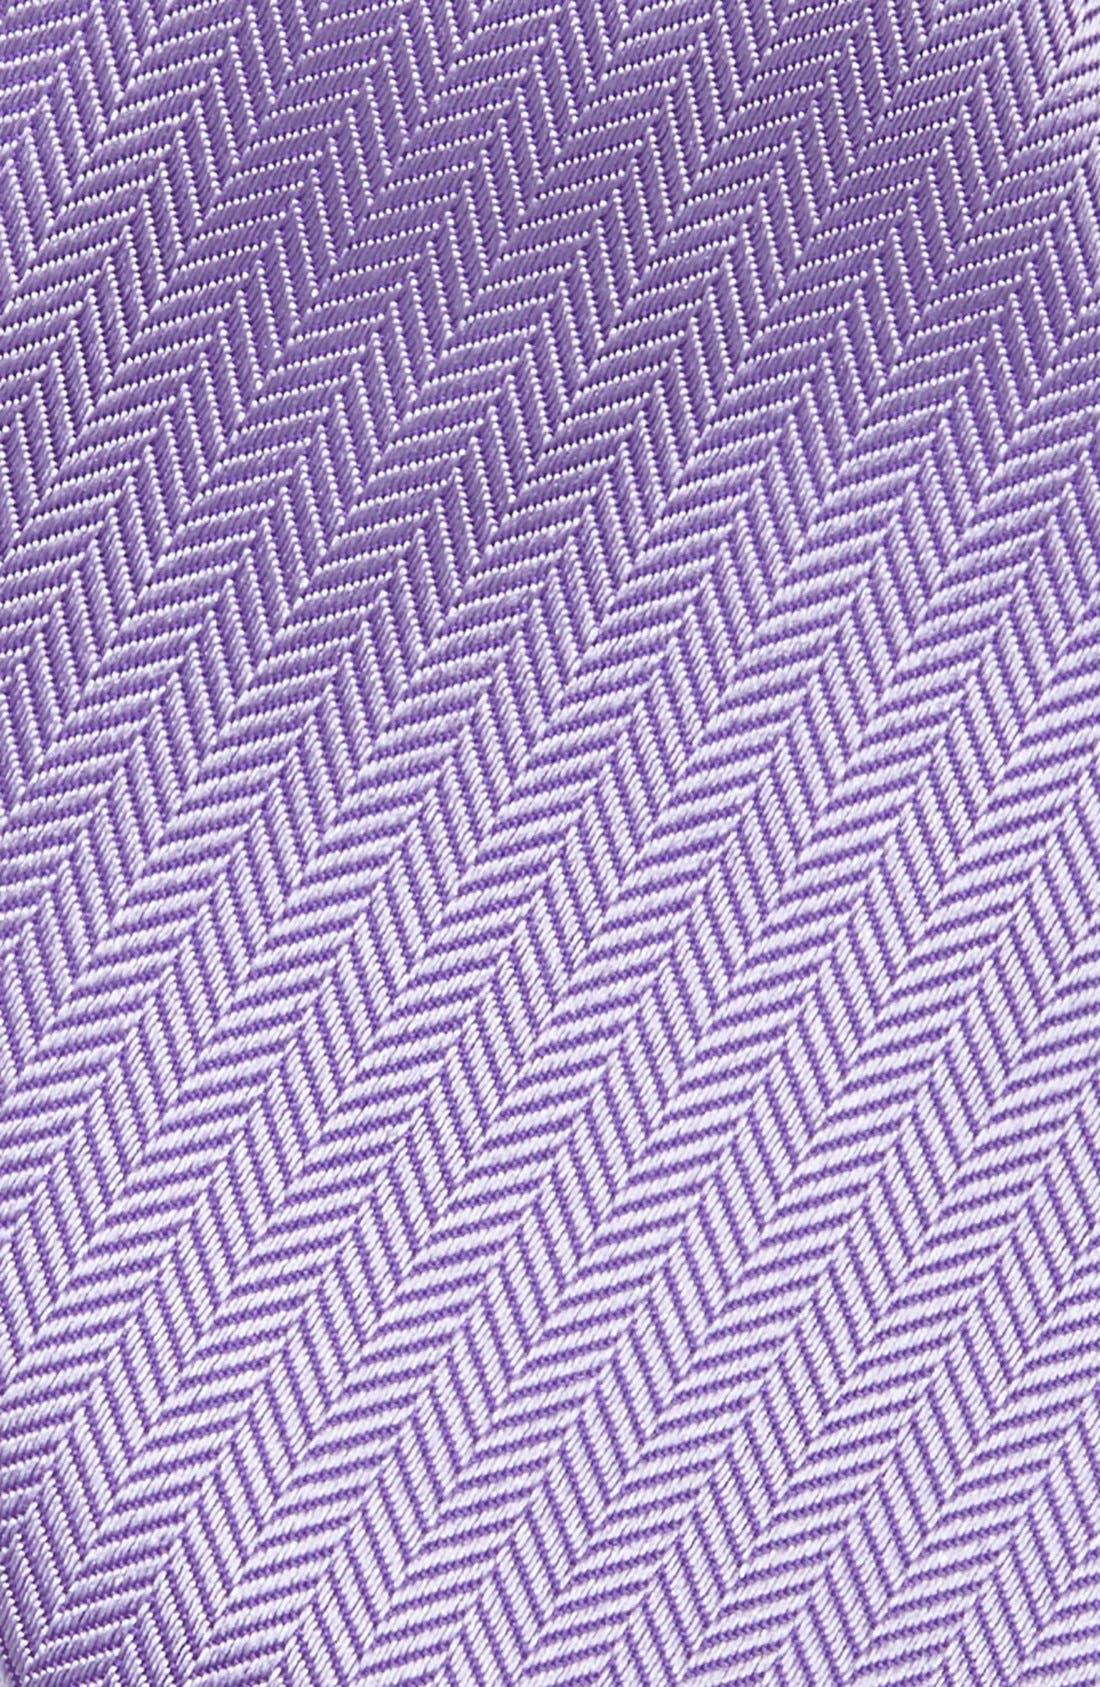 Herringbone Textured Silk Tie,                             Alternate thumbnail 3, color,                             LAVENDER